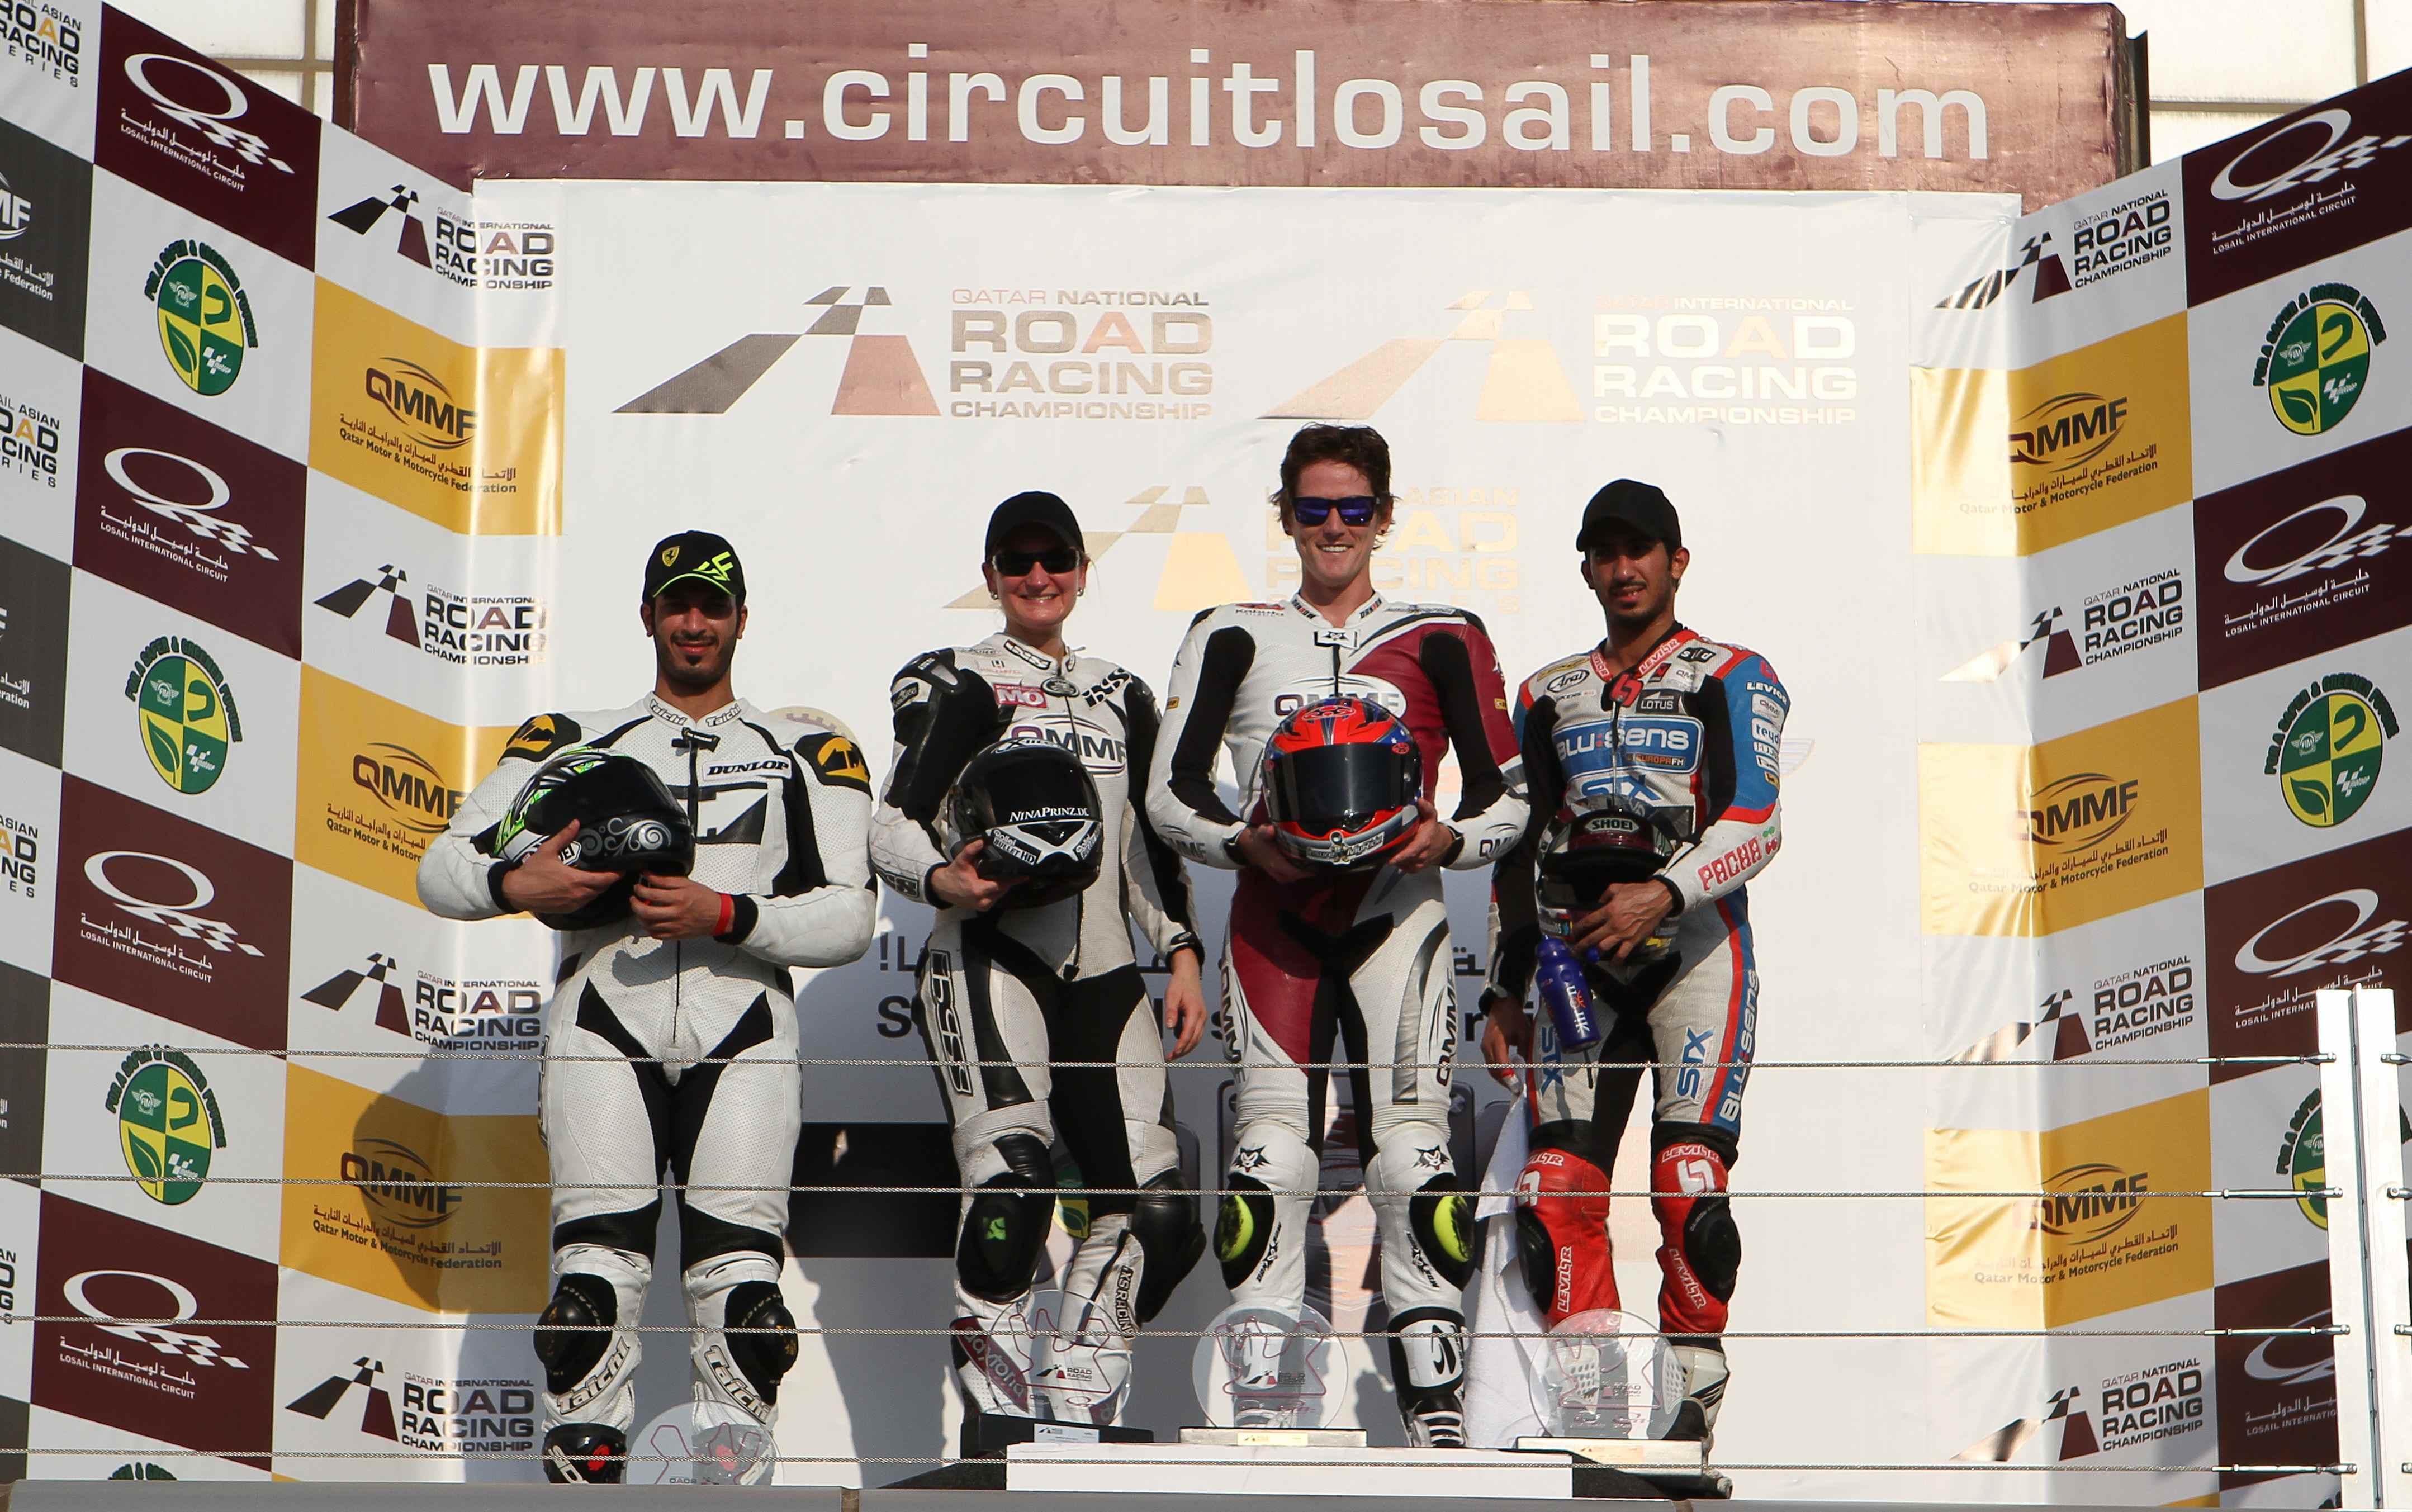 Qatar QIRRCH: Alex Cudlin unstoppable in the first round of Qatar International Road Racing